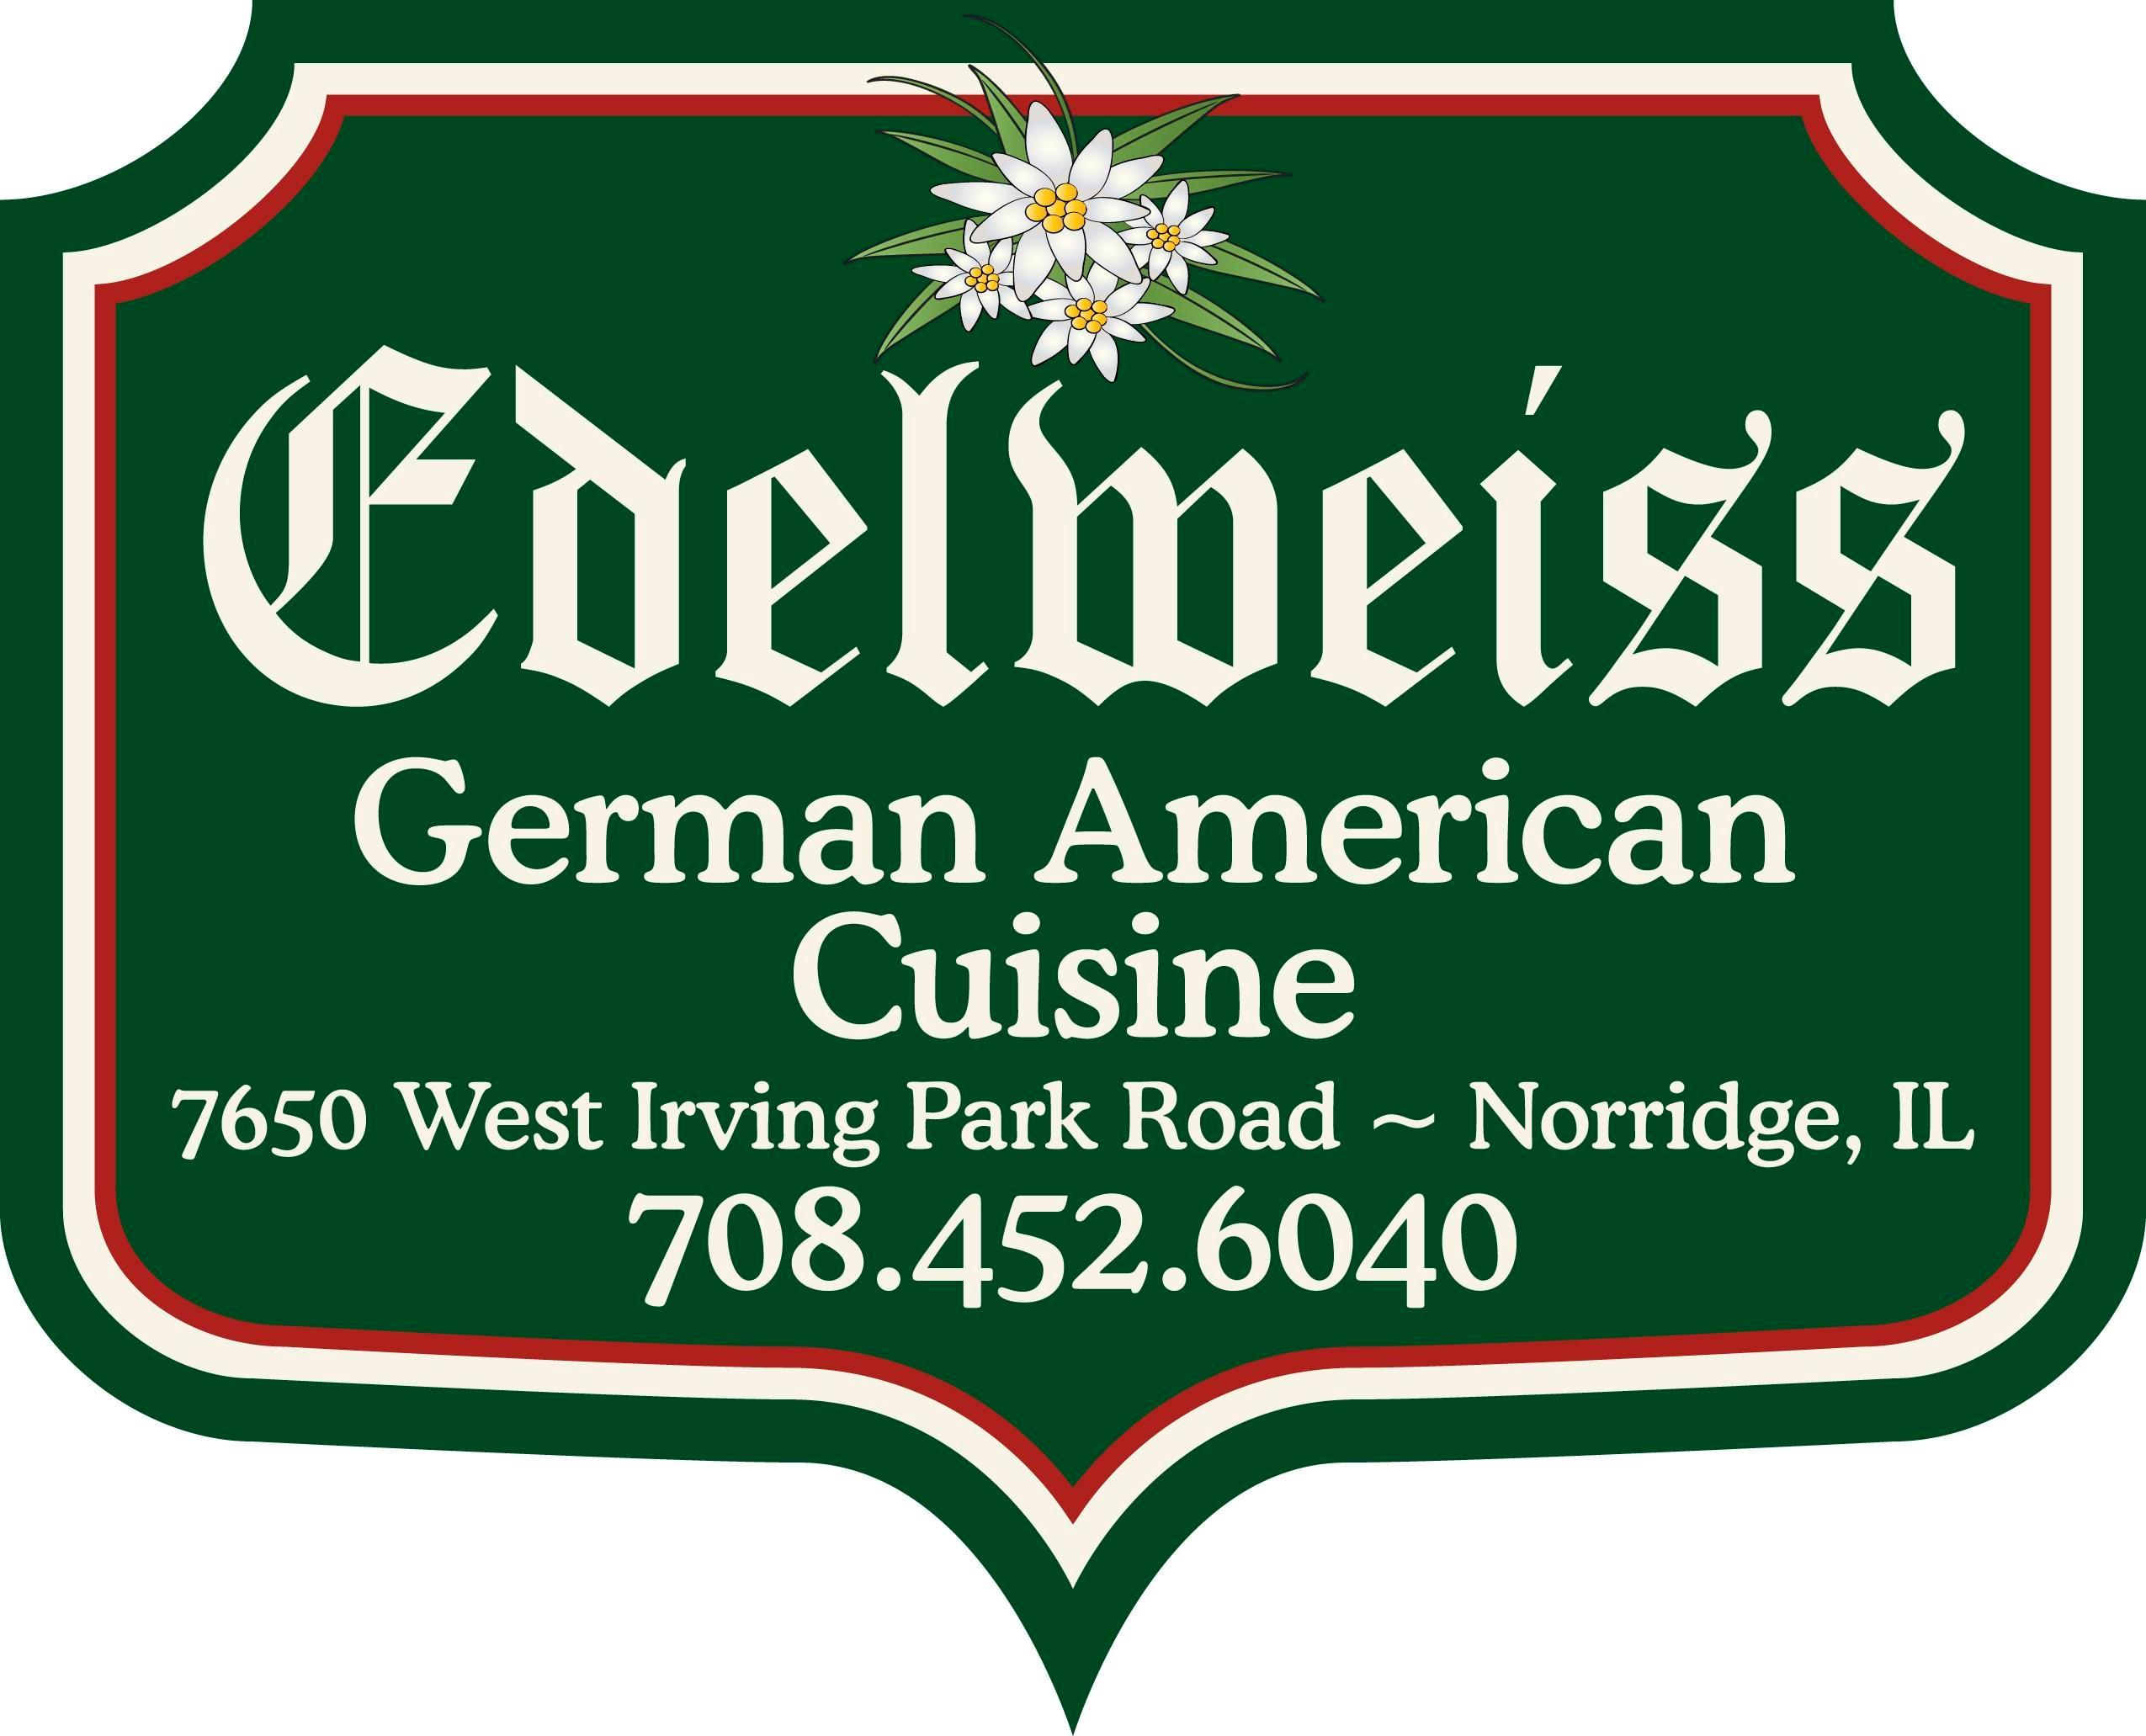 Edelweiss German/American Restaurant